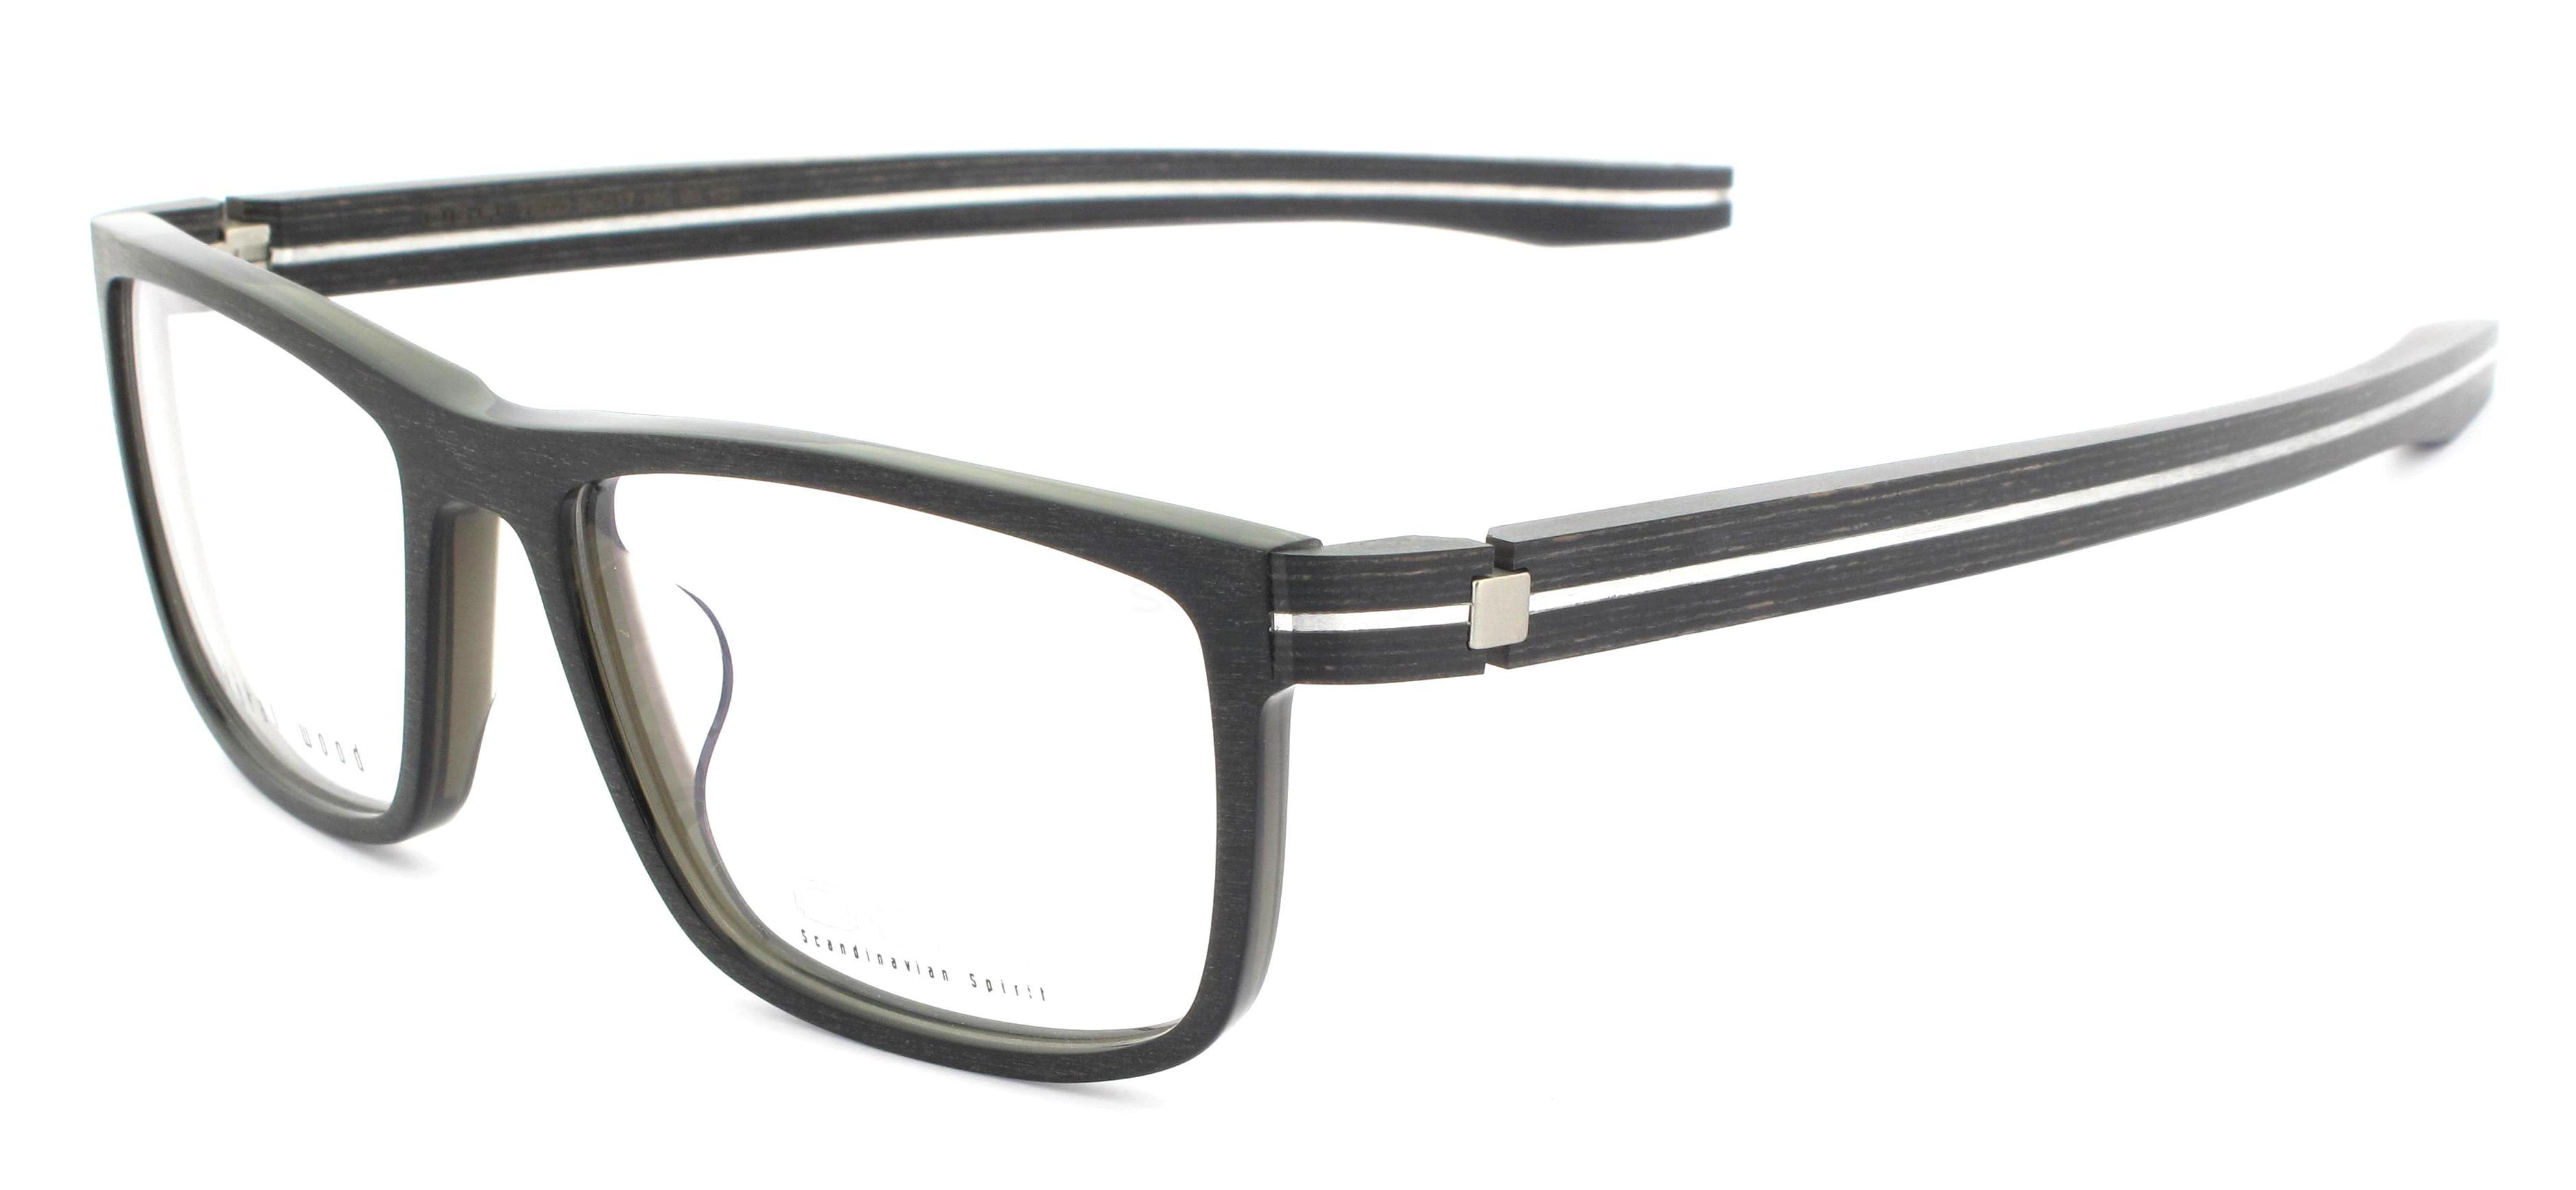 GG022 7788O PILTRA (WOOD) Glasses, ÖGA Scandinavian Spirit